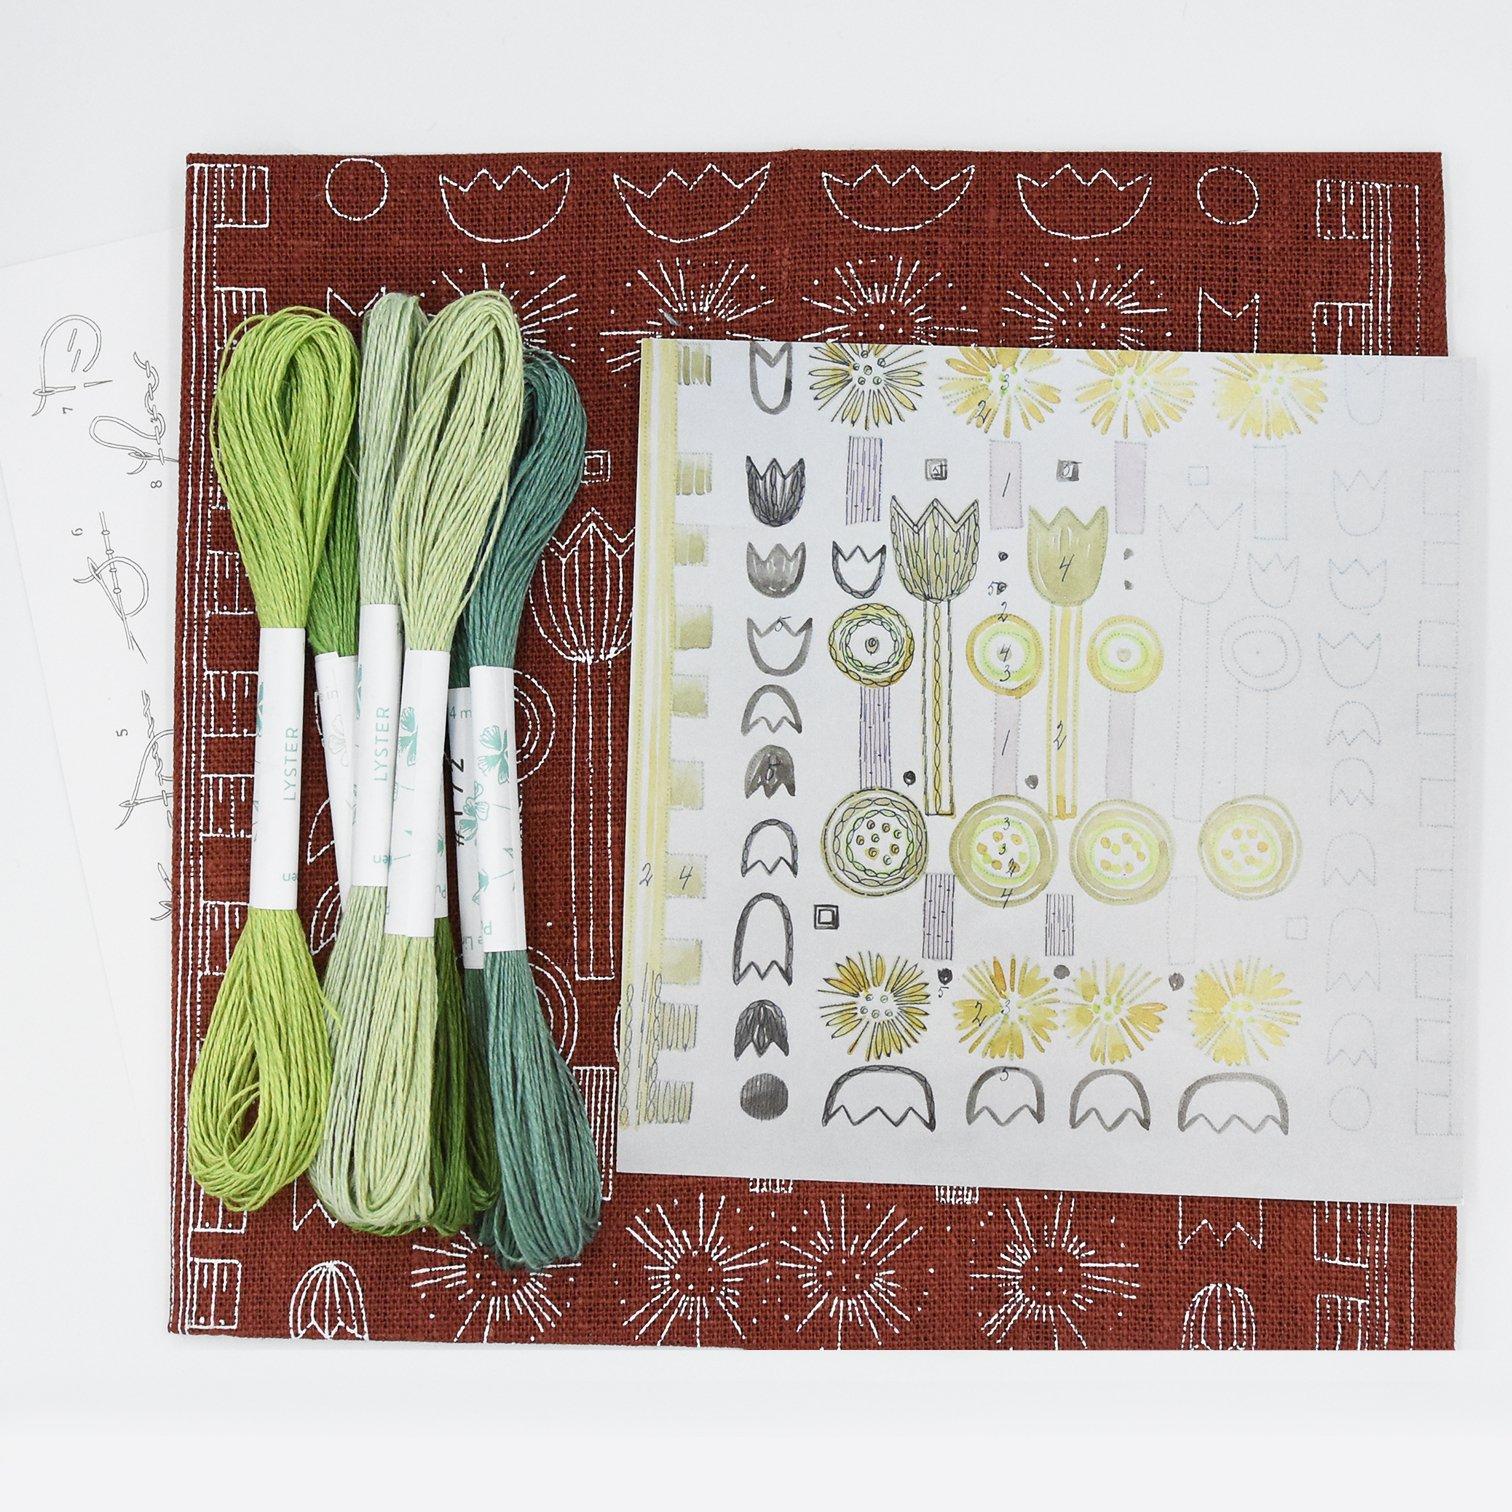 Linladan - Tulip 7409 - Swedish Embroidery Kit 21